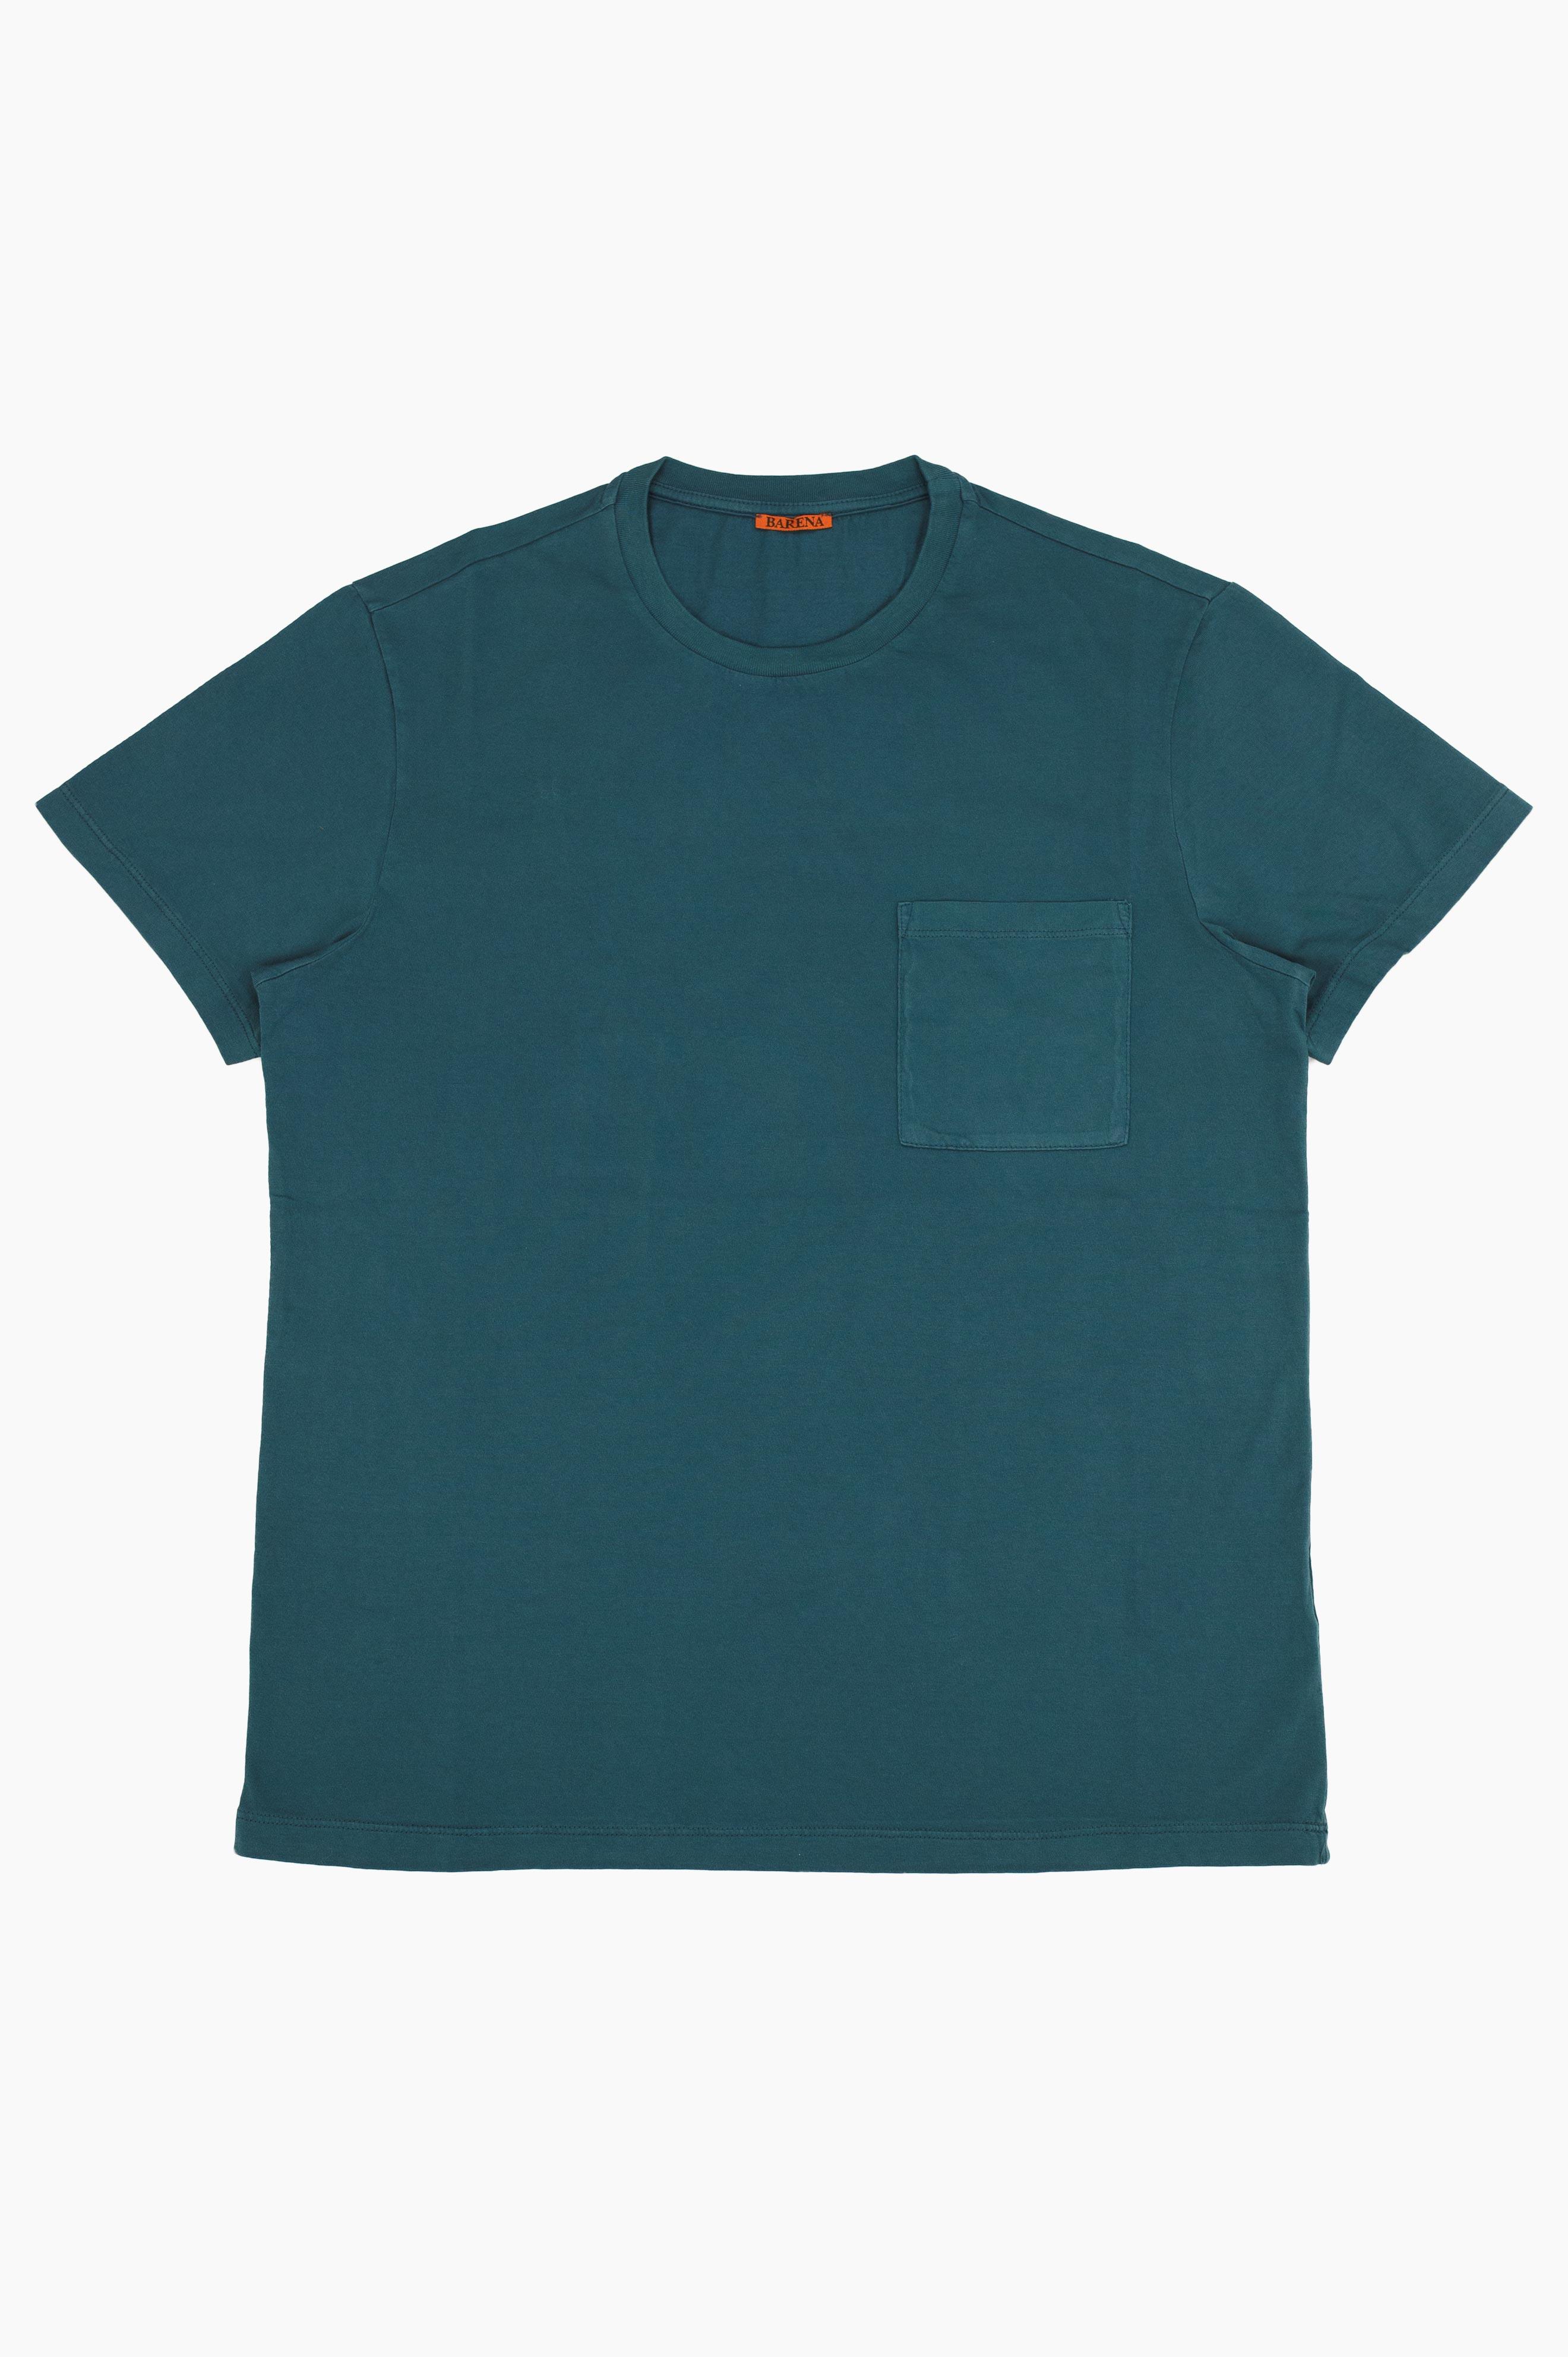 Giro Pocket T-Shirt Petrol Blue